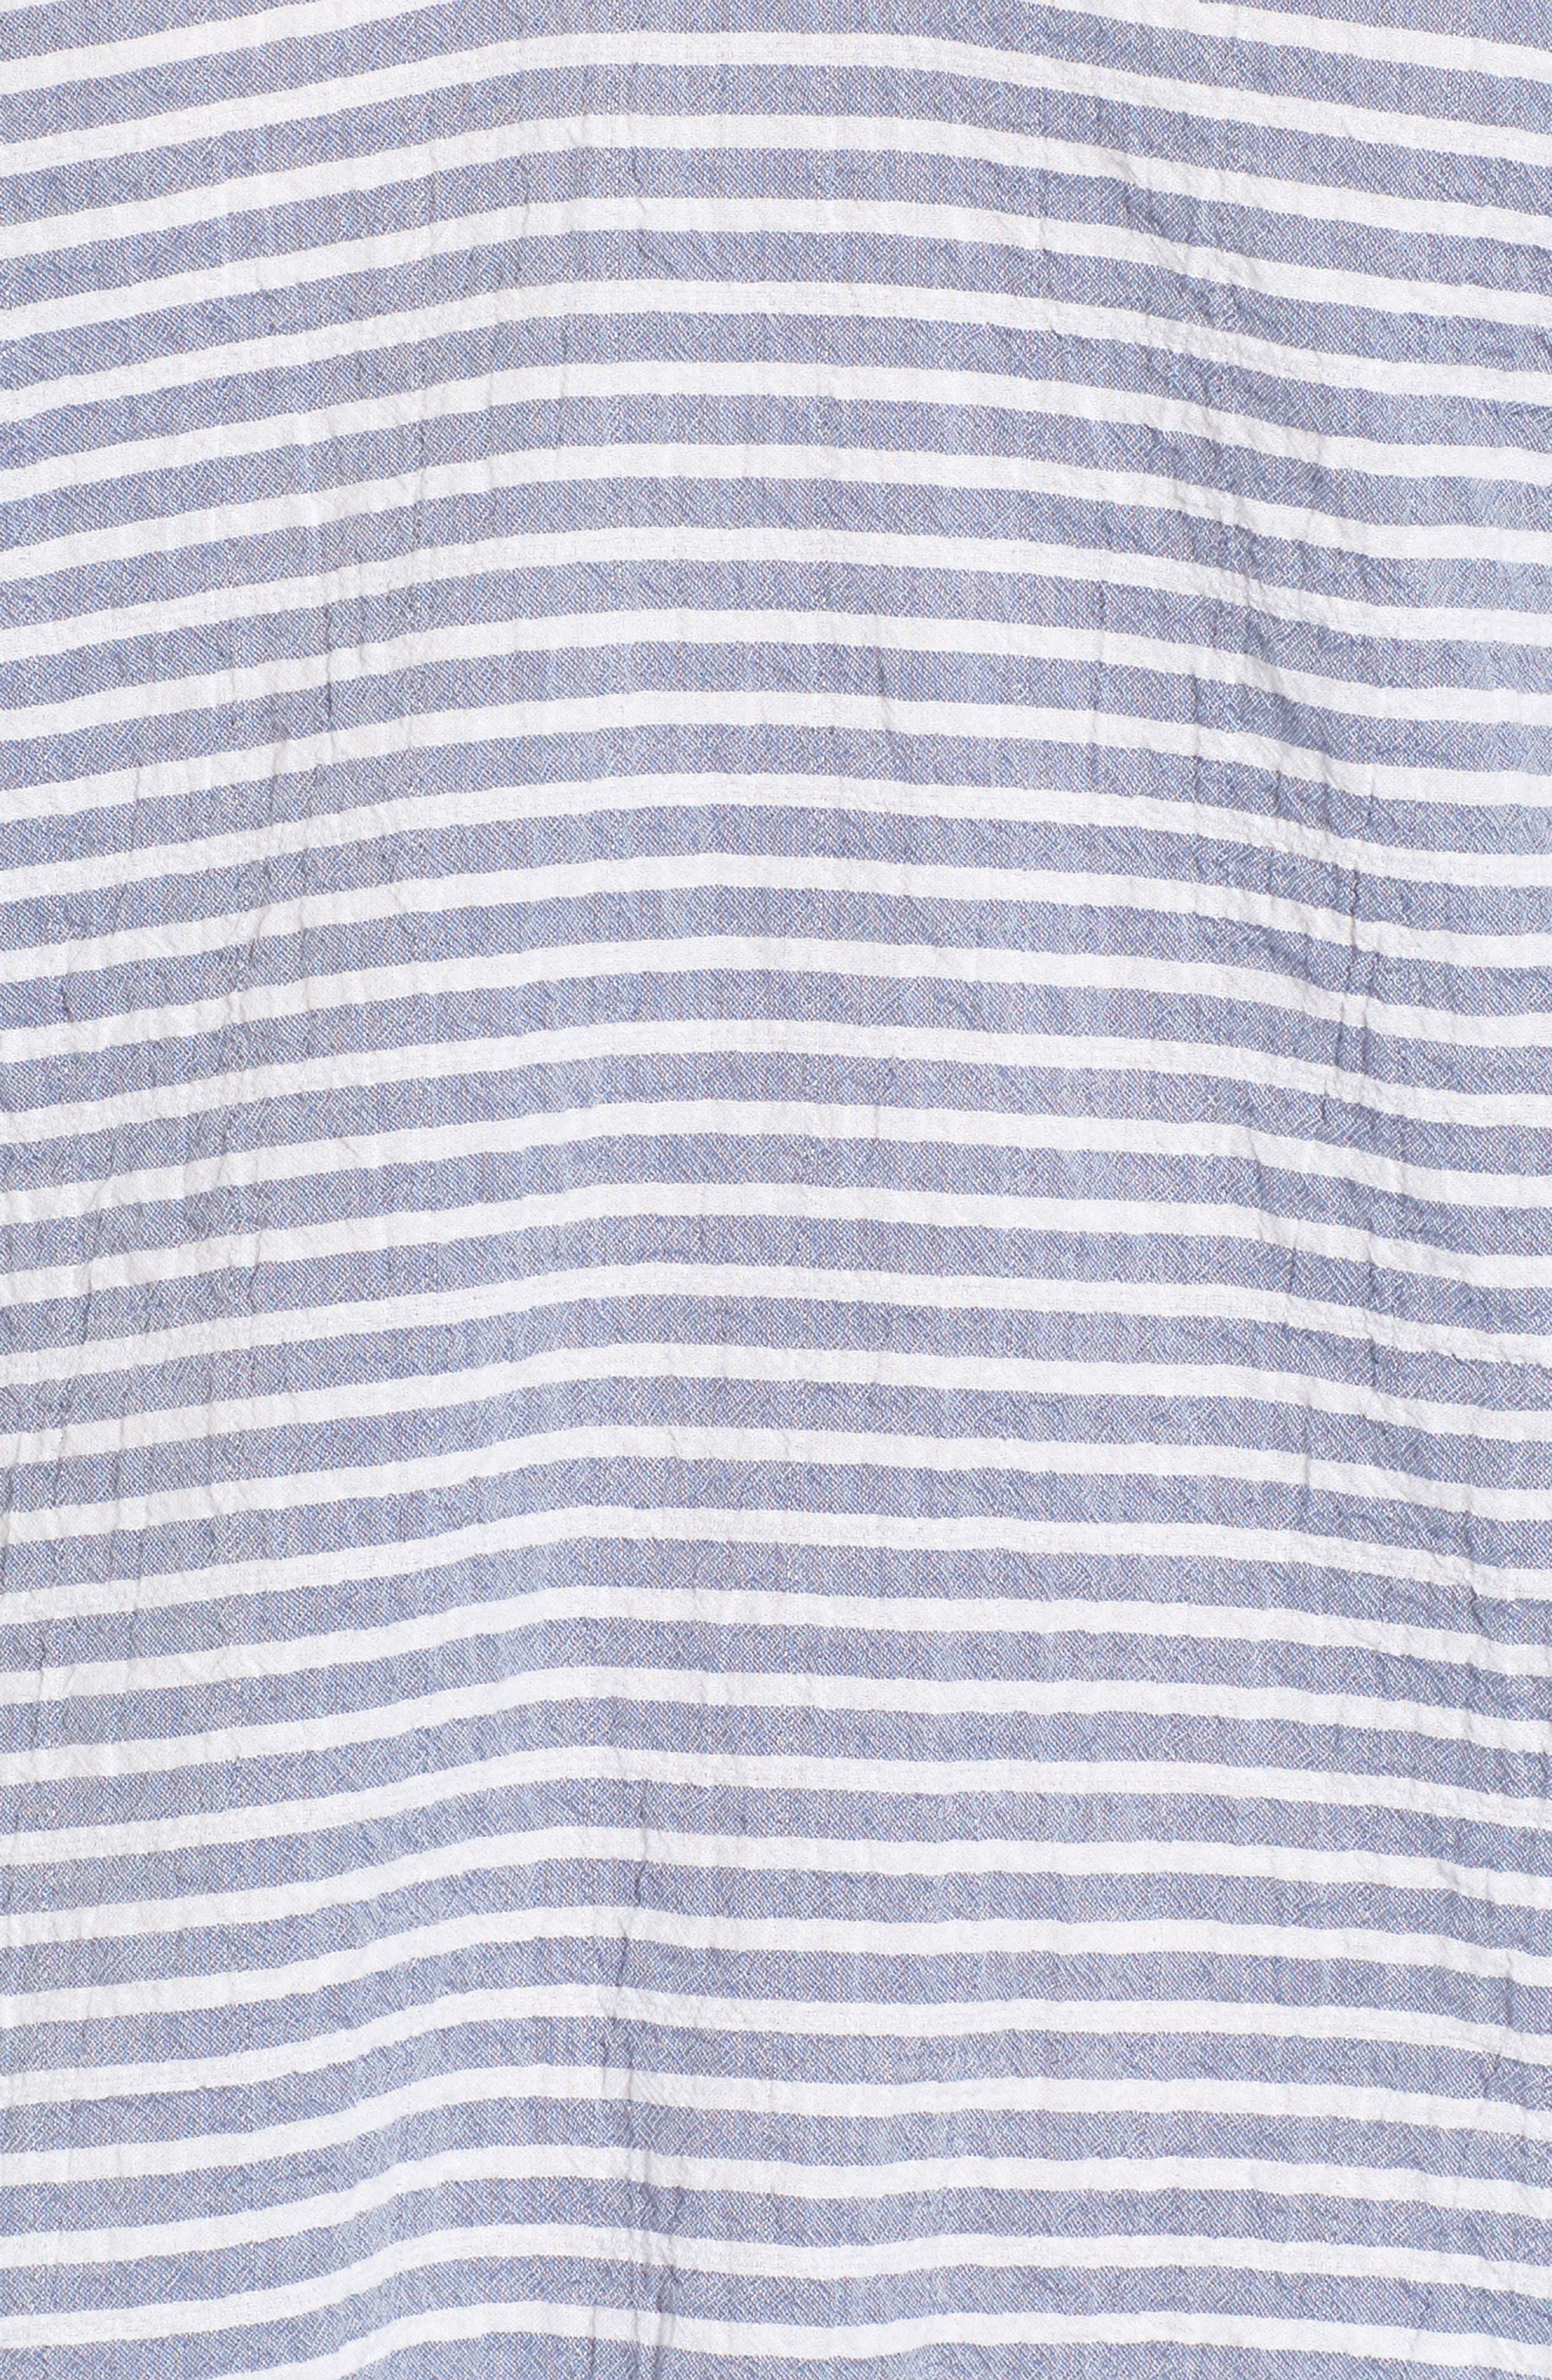 Tie Waist Stripe Seersucker Top,                             Alternate thumbnail 5, color,                             Blue- White Stripe